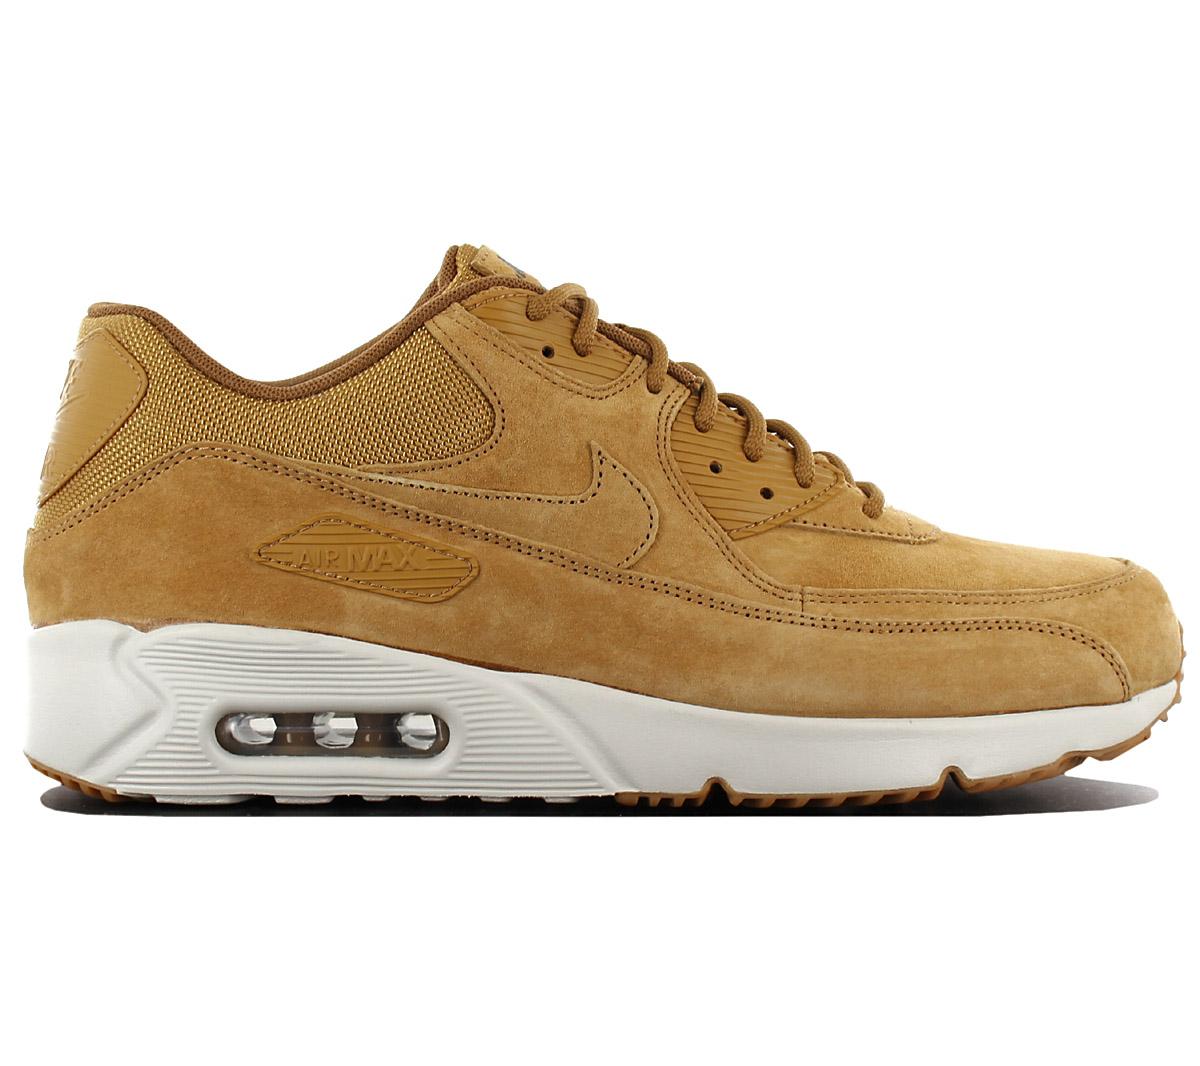 Nike Sportswear Sneaker Air Max 90 Ultra 2.0 Leather